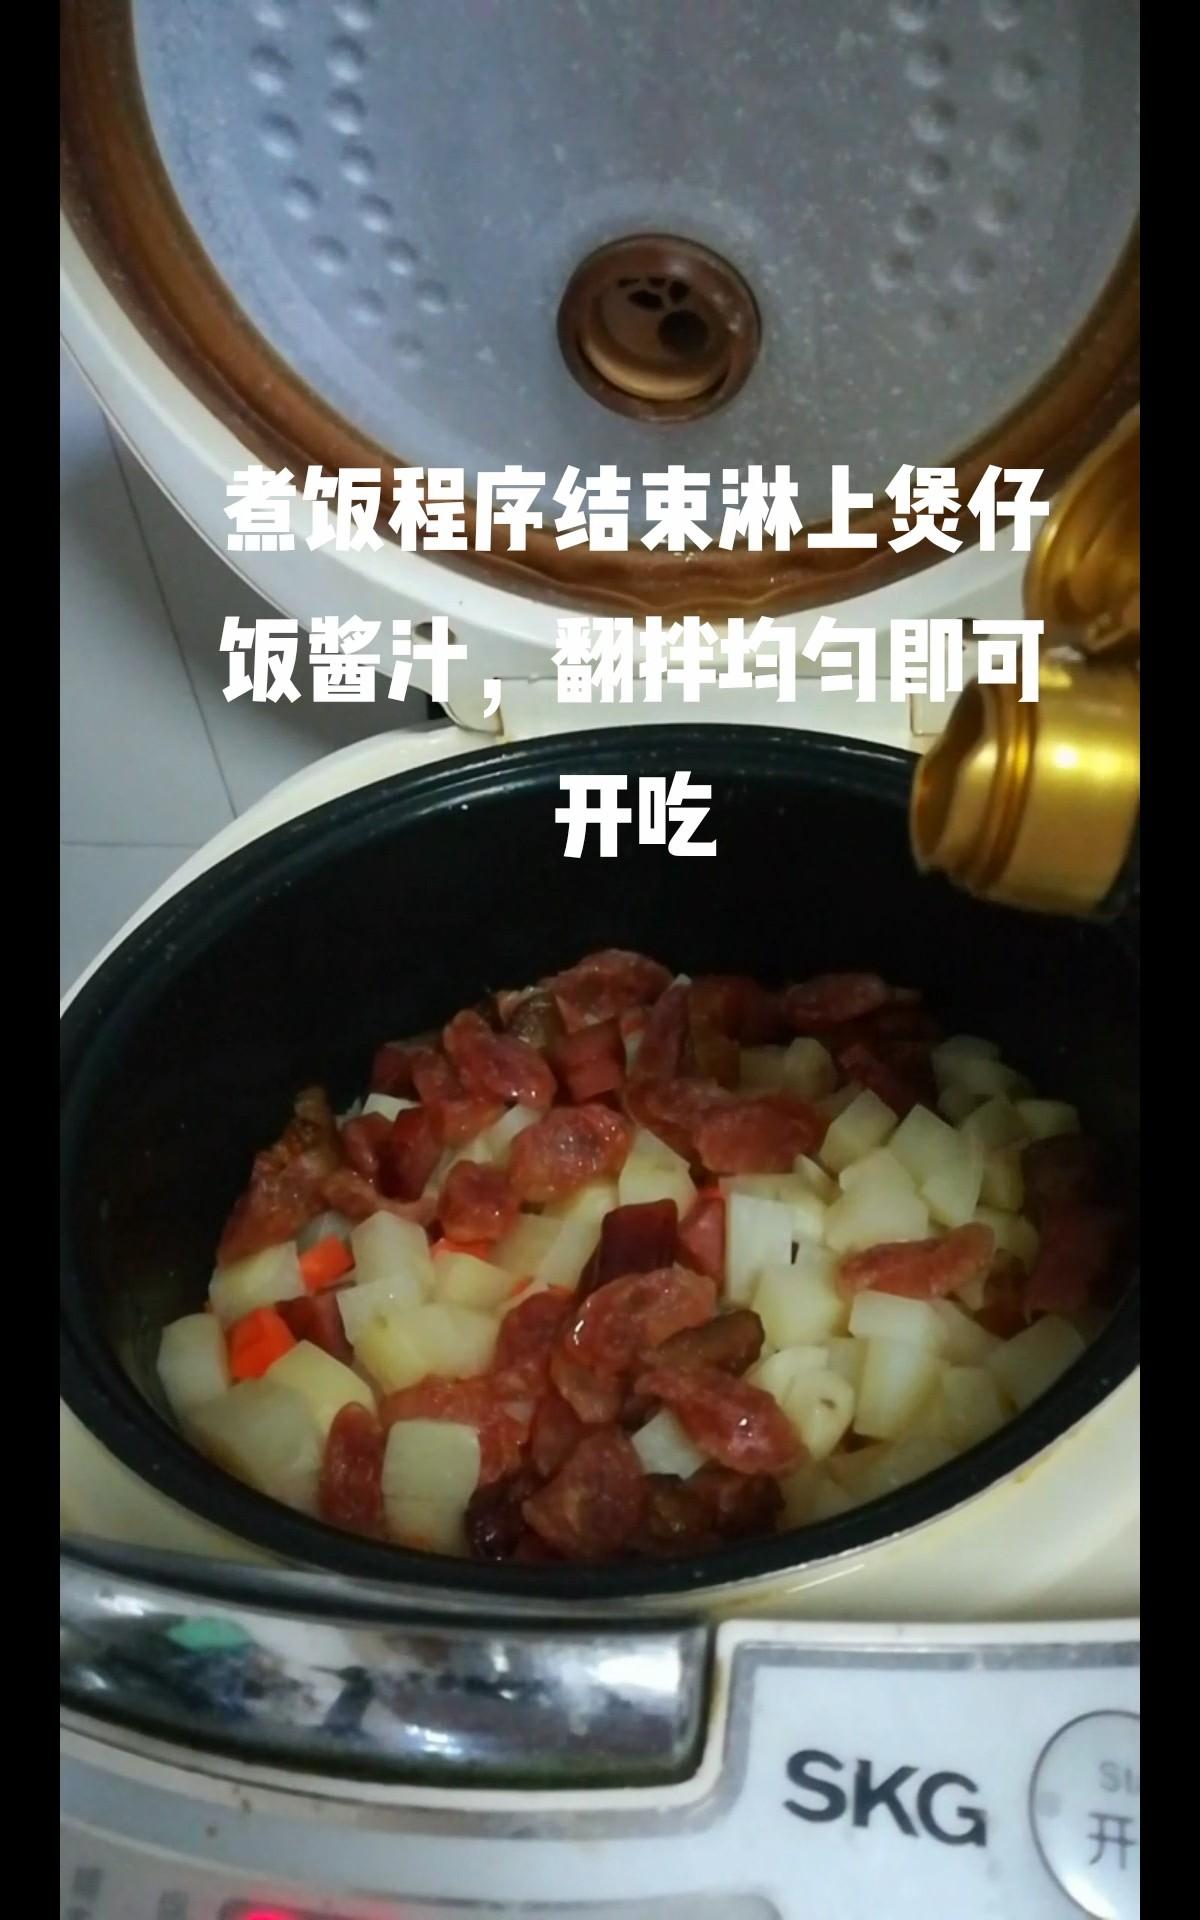 土豆腊味焖饭怎么做